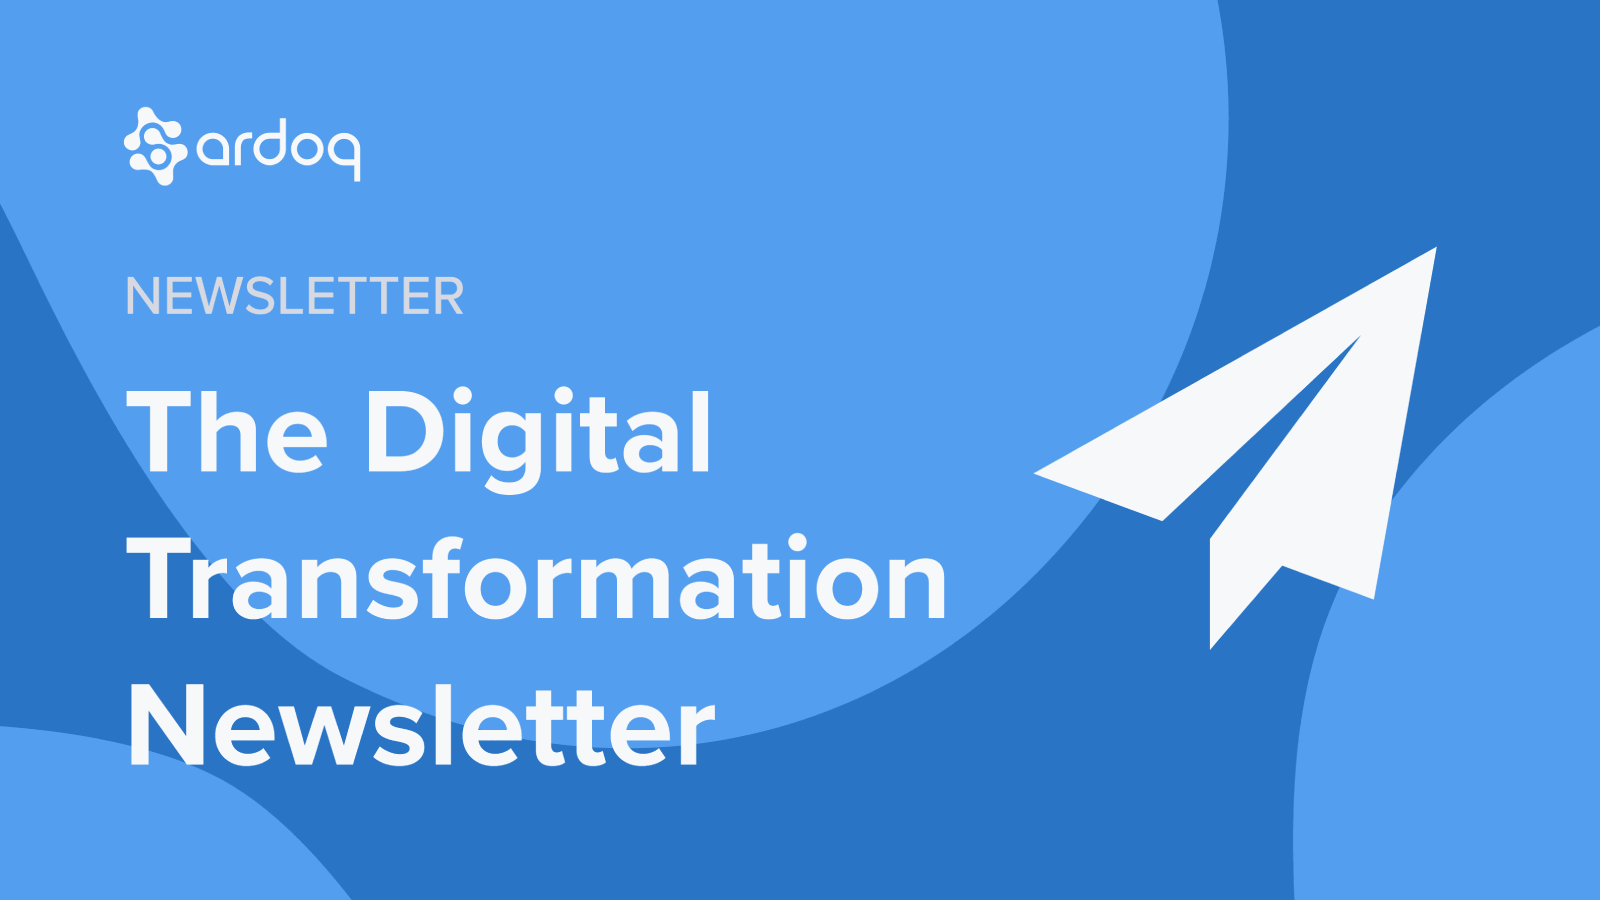 the digital transformation newsletter